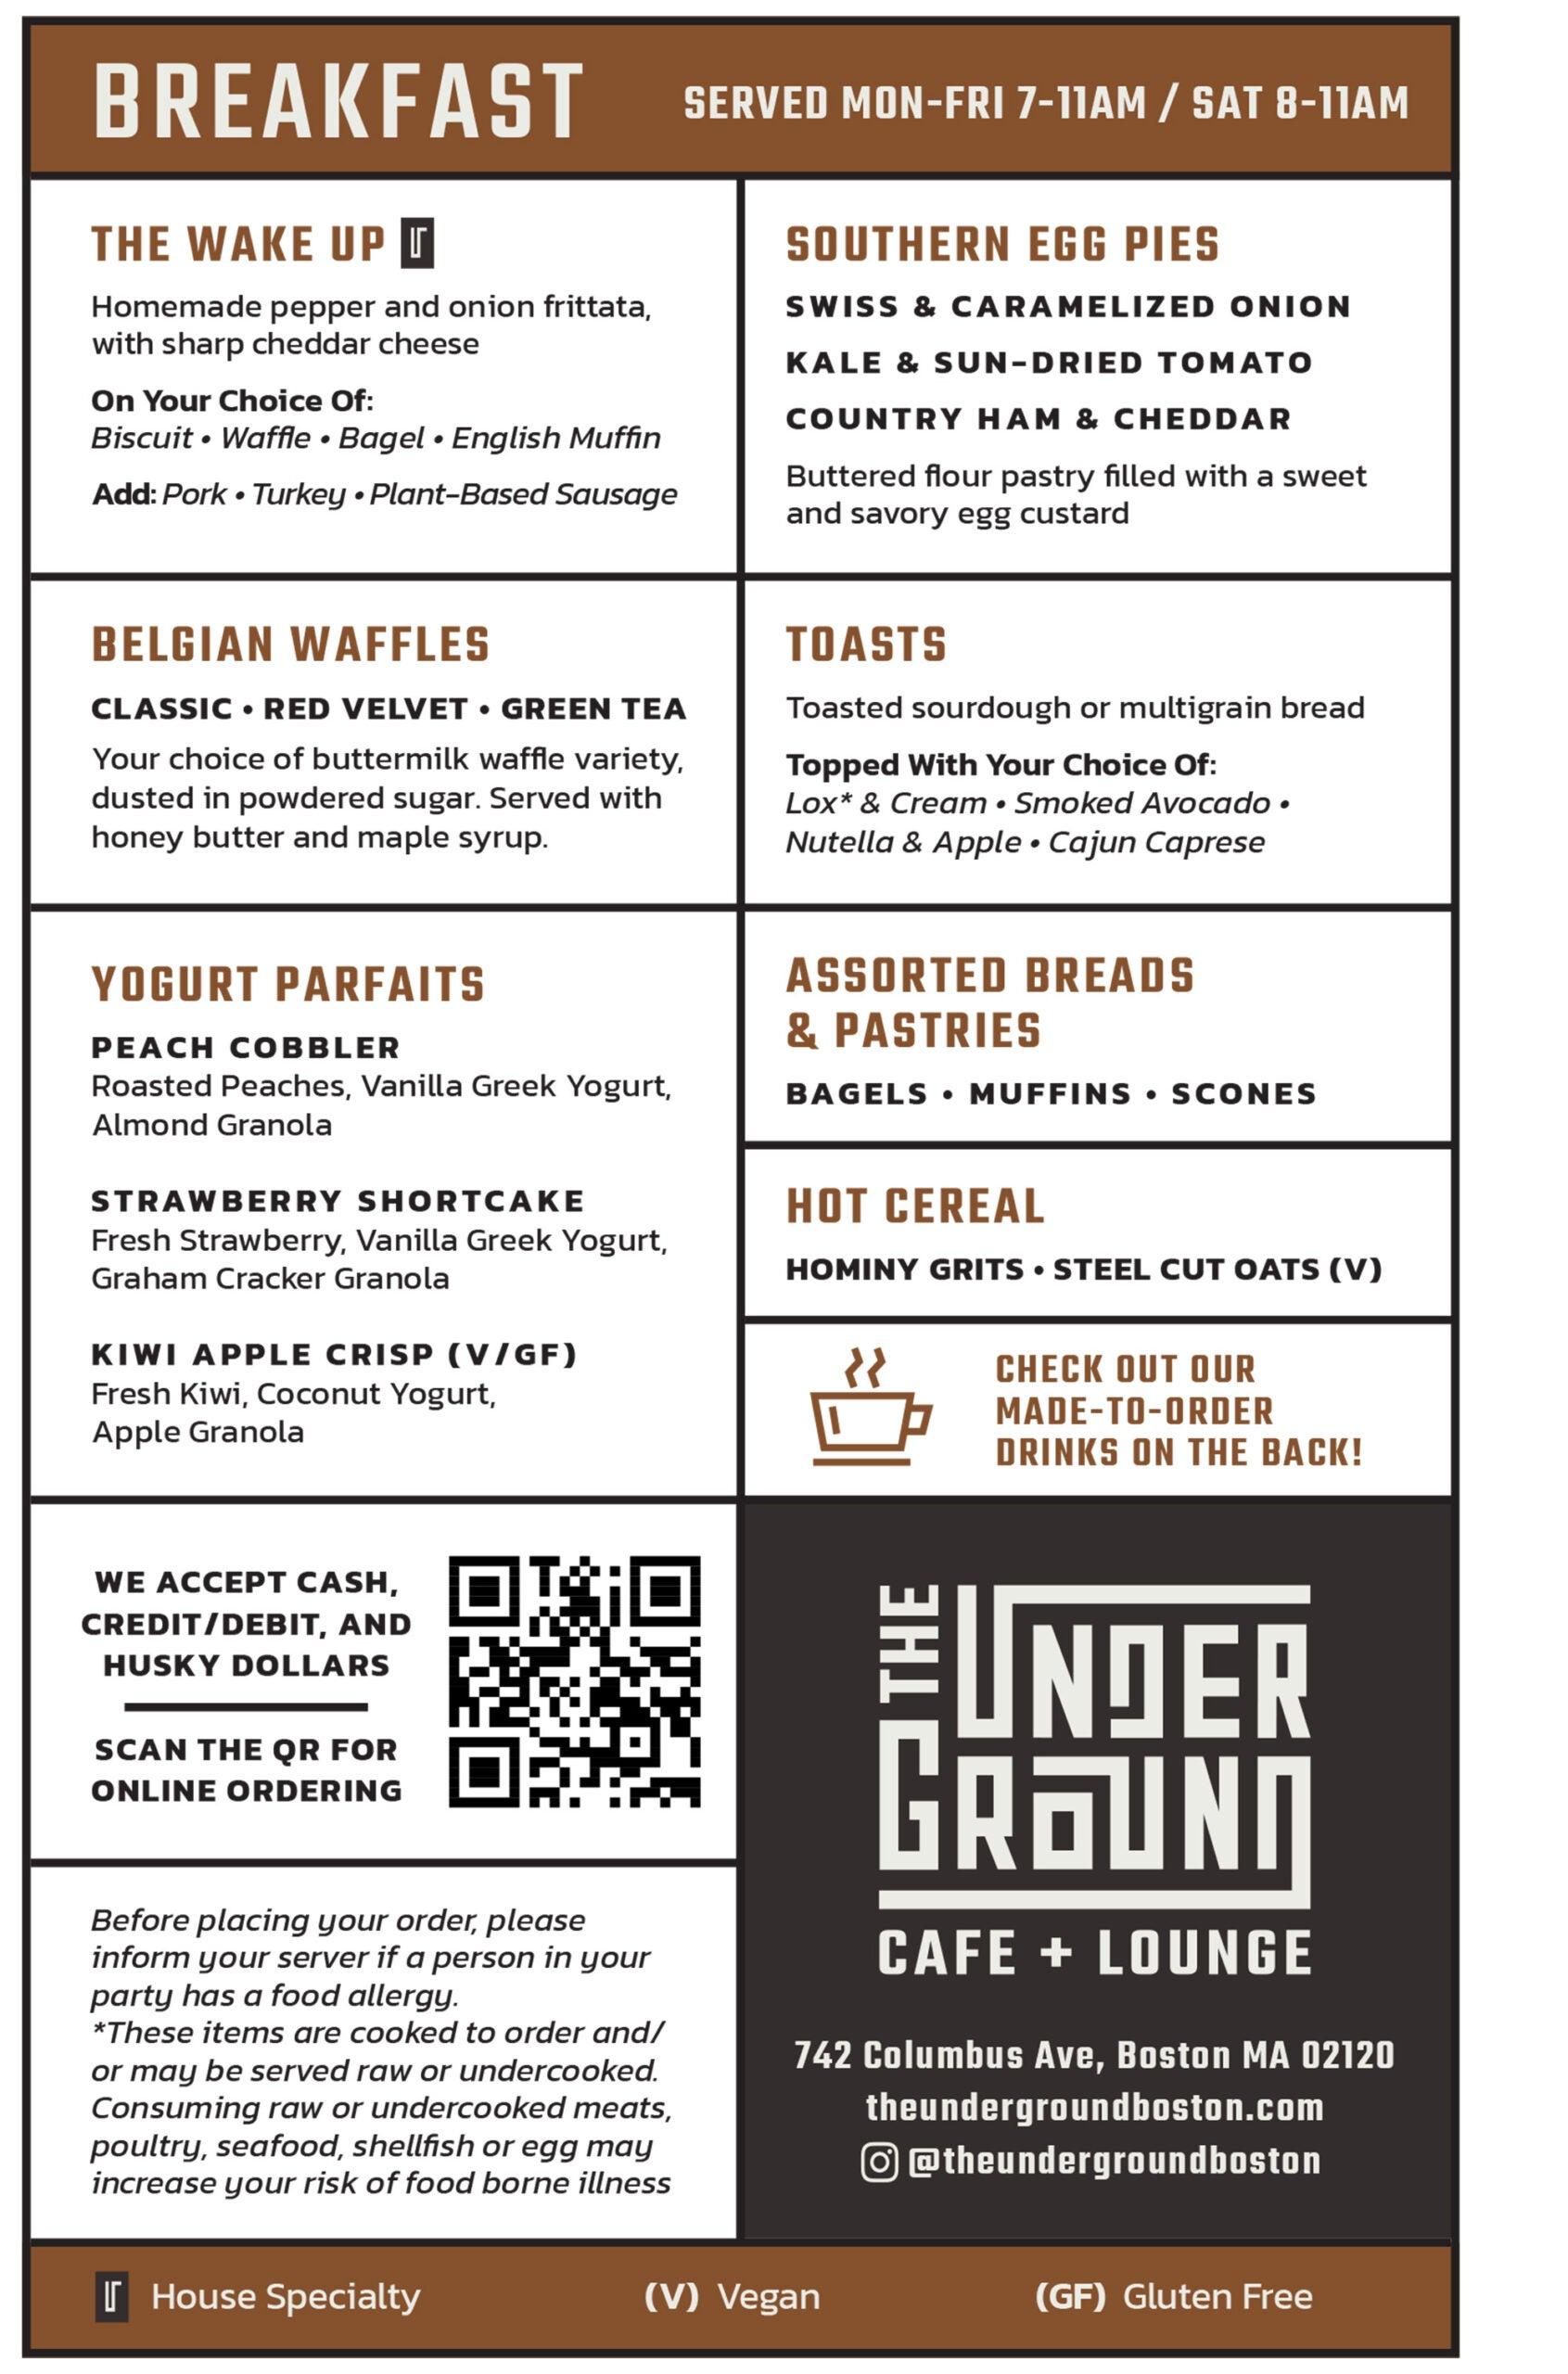 The Underground Cafe + Lounge menu